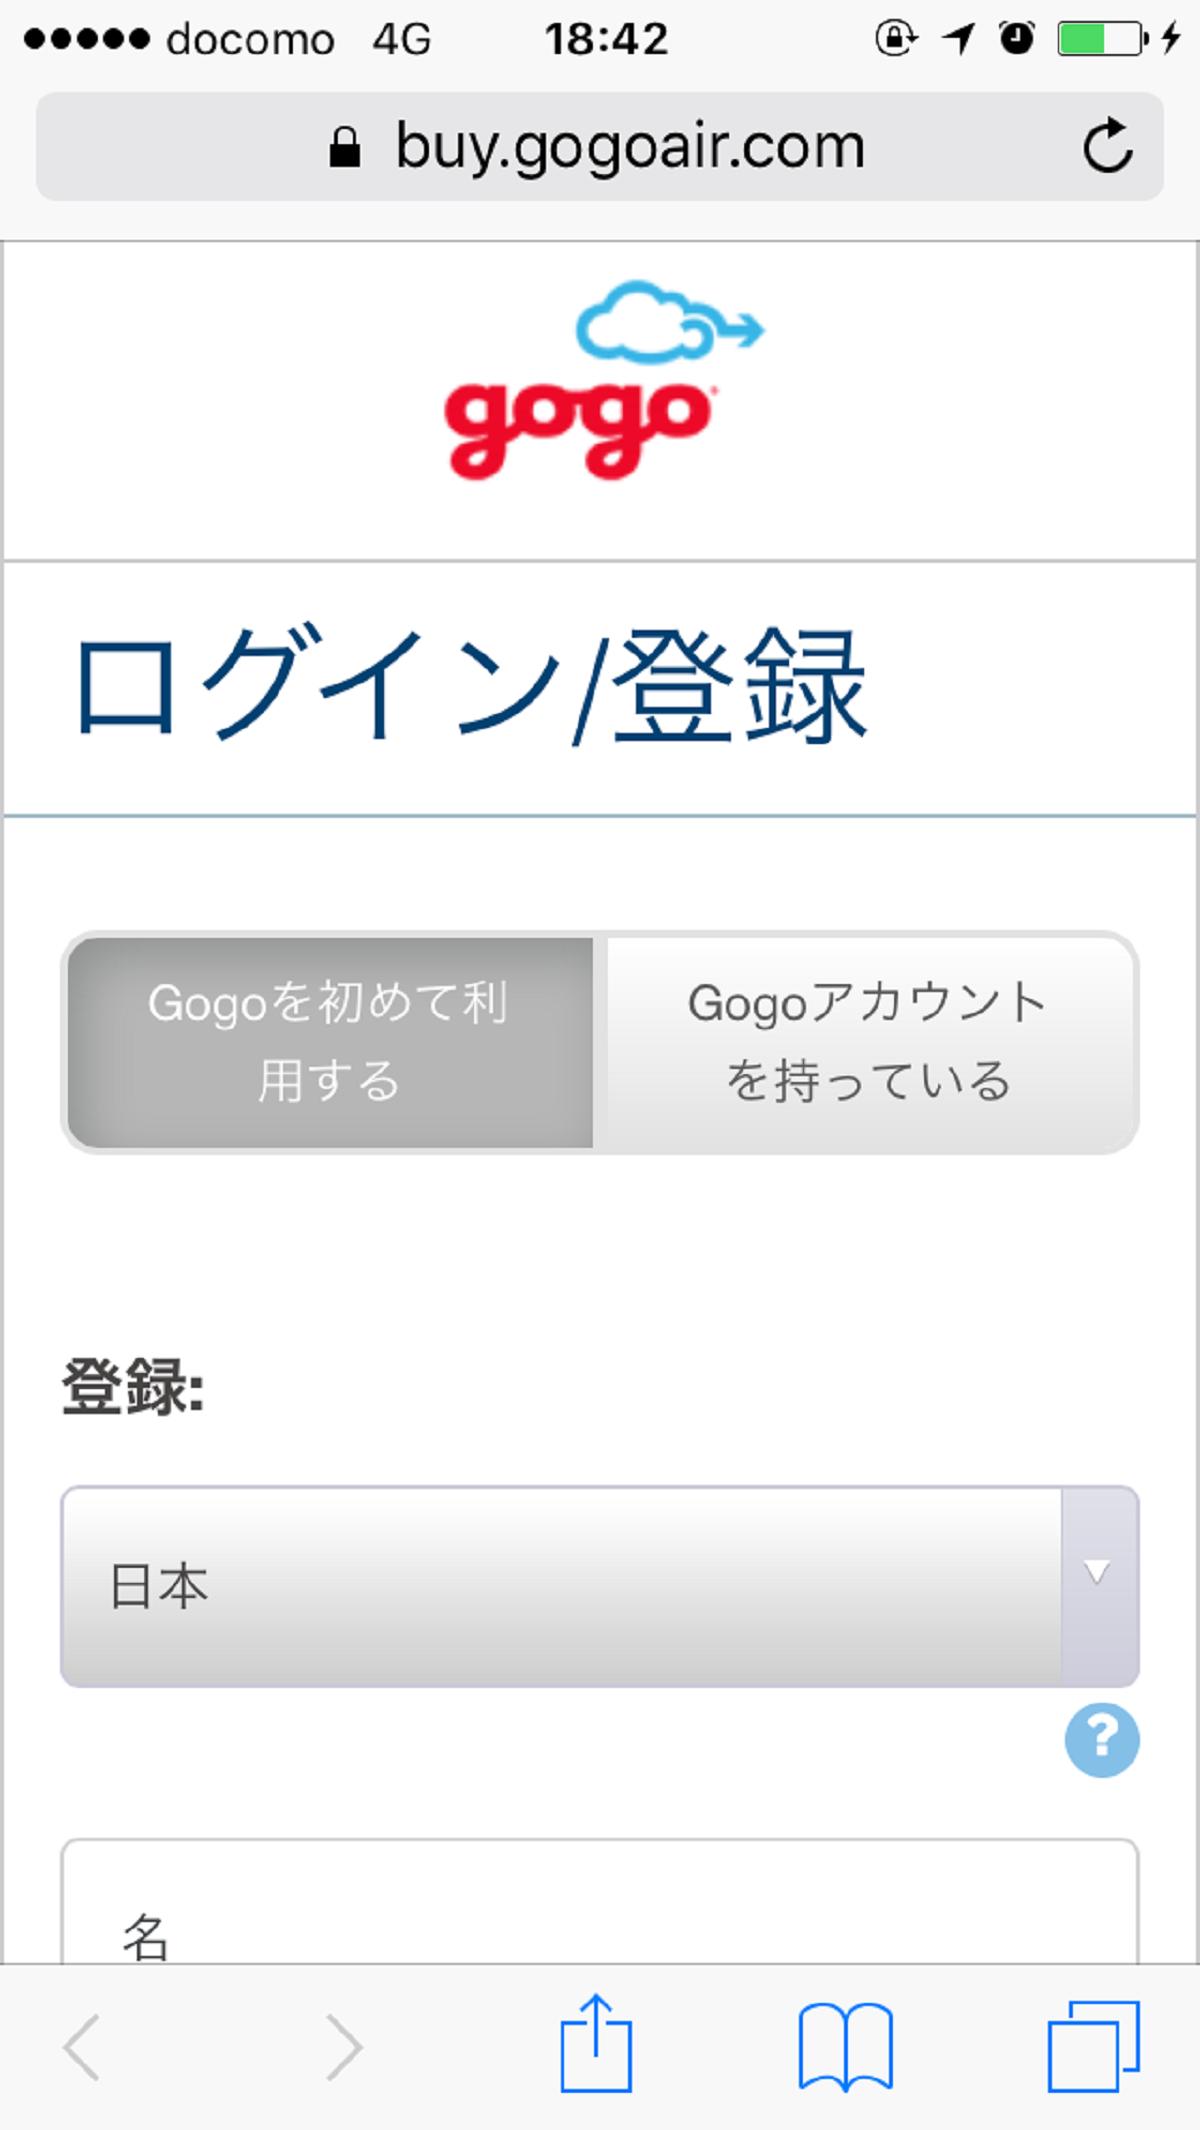 Gogoアカウントを作成